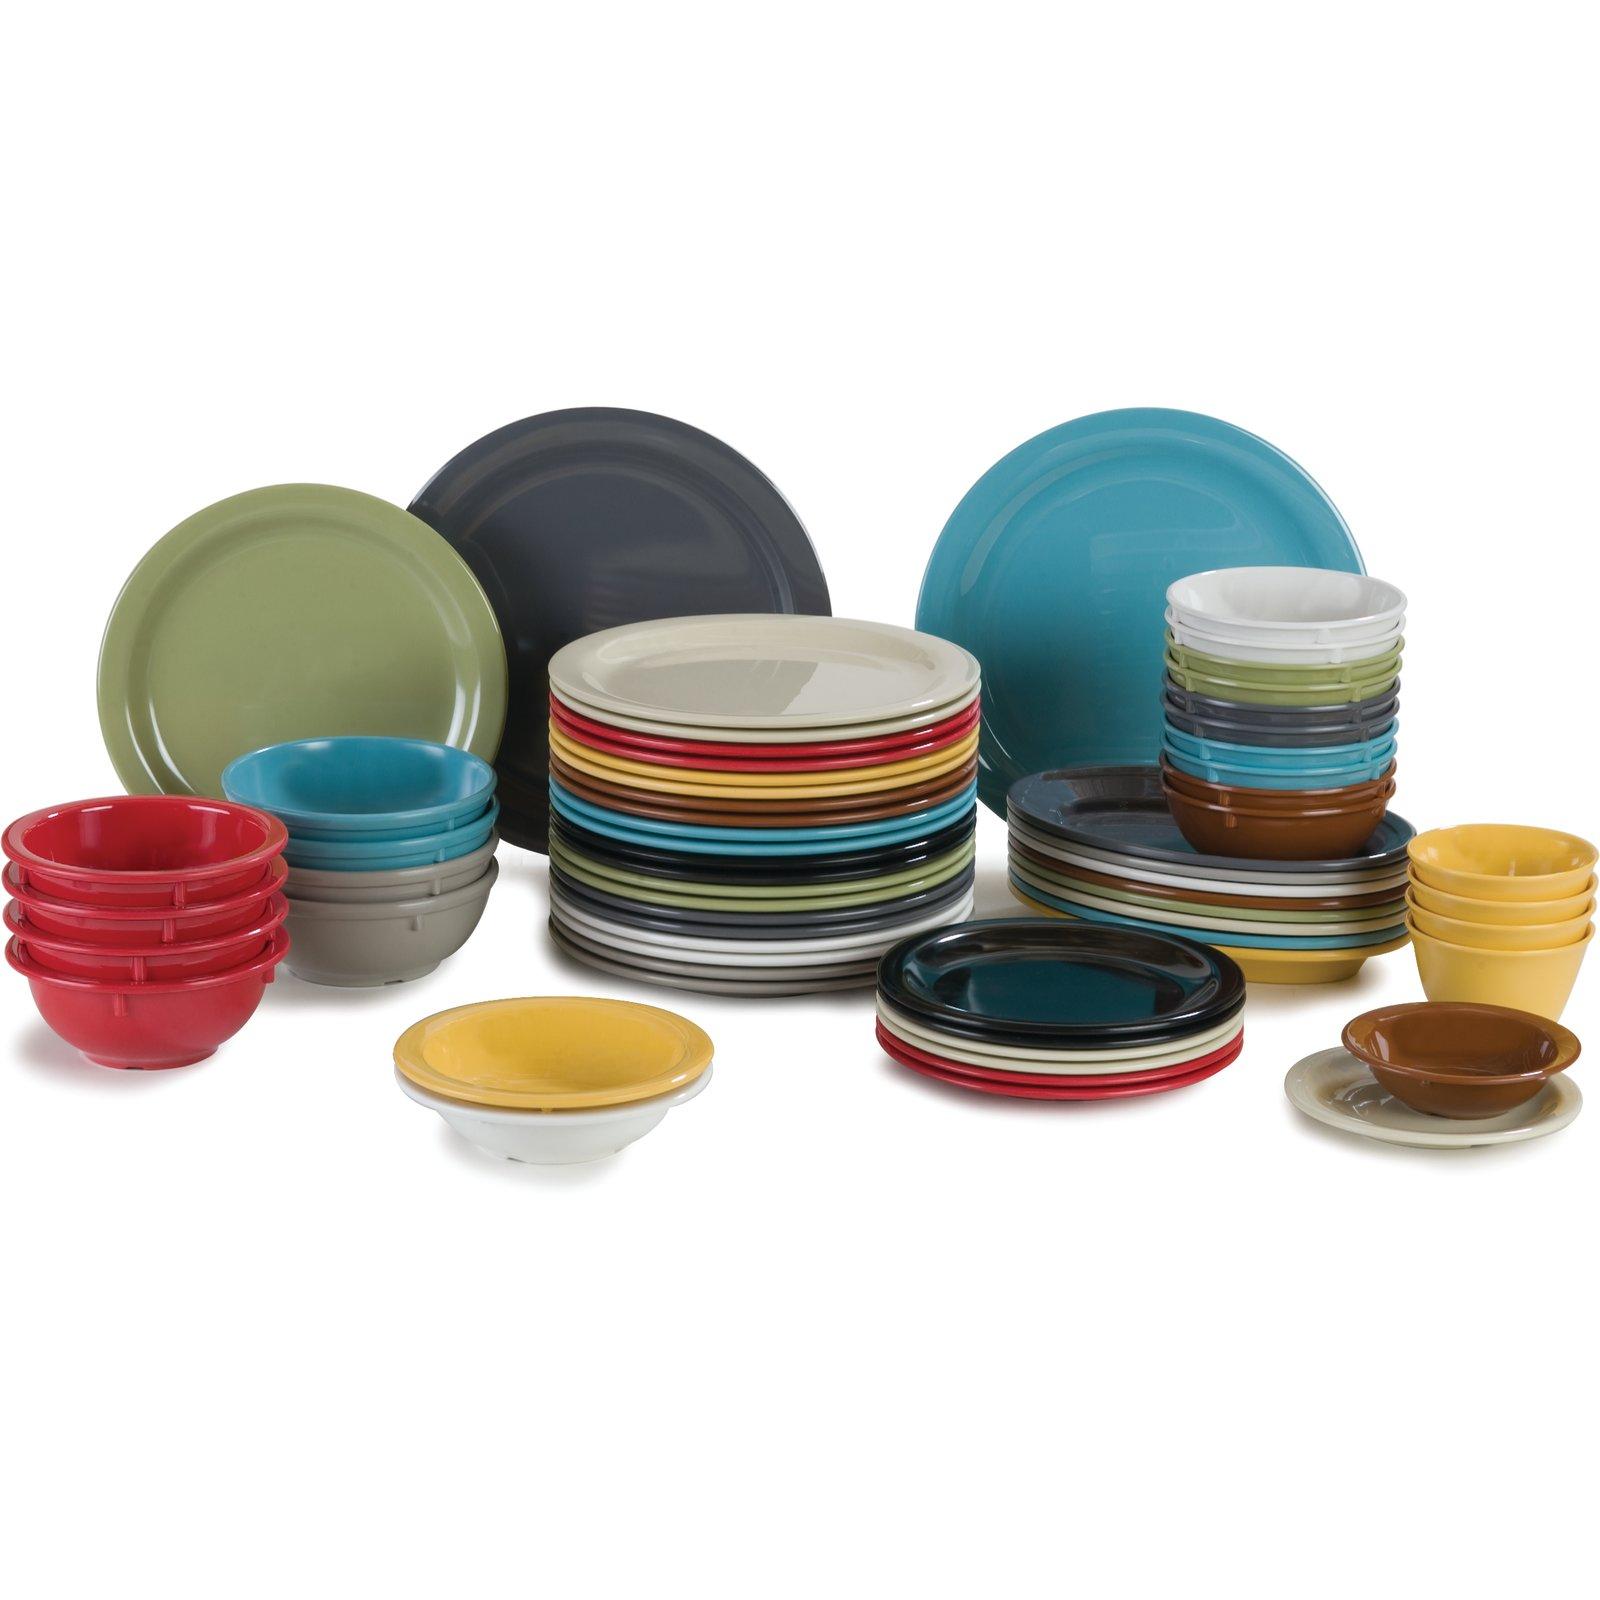 ... 4385443 - Dayton™ Melamine Salad Plate 7.25  - Toffee  sc 1 st  Carlisle FoodService Products & 4385443 - Dayton™ Melamine Salad Plate 7.25